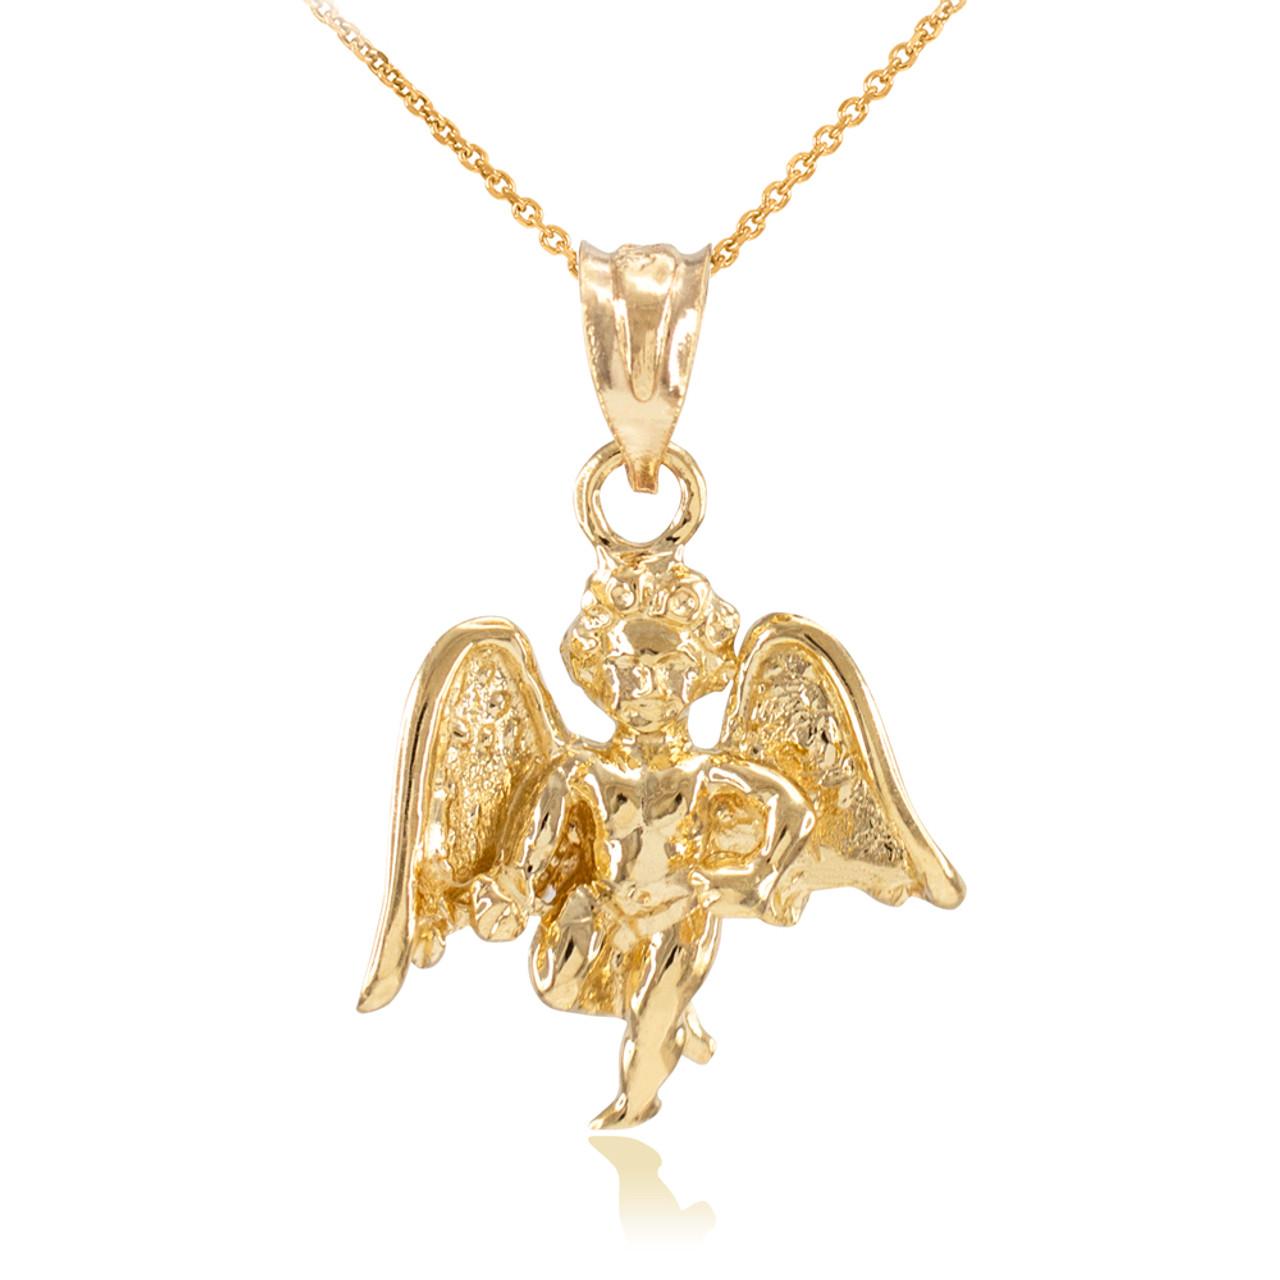 18bb6c97ac0ec Solid Gold Guardian Angel Pendant Necklace